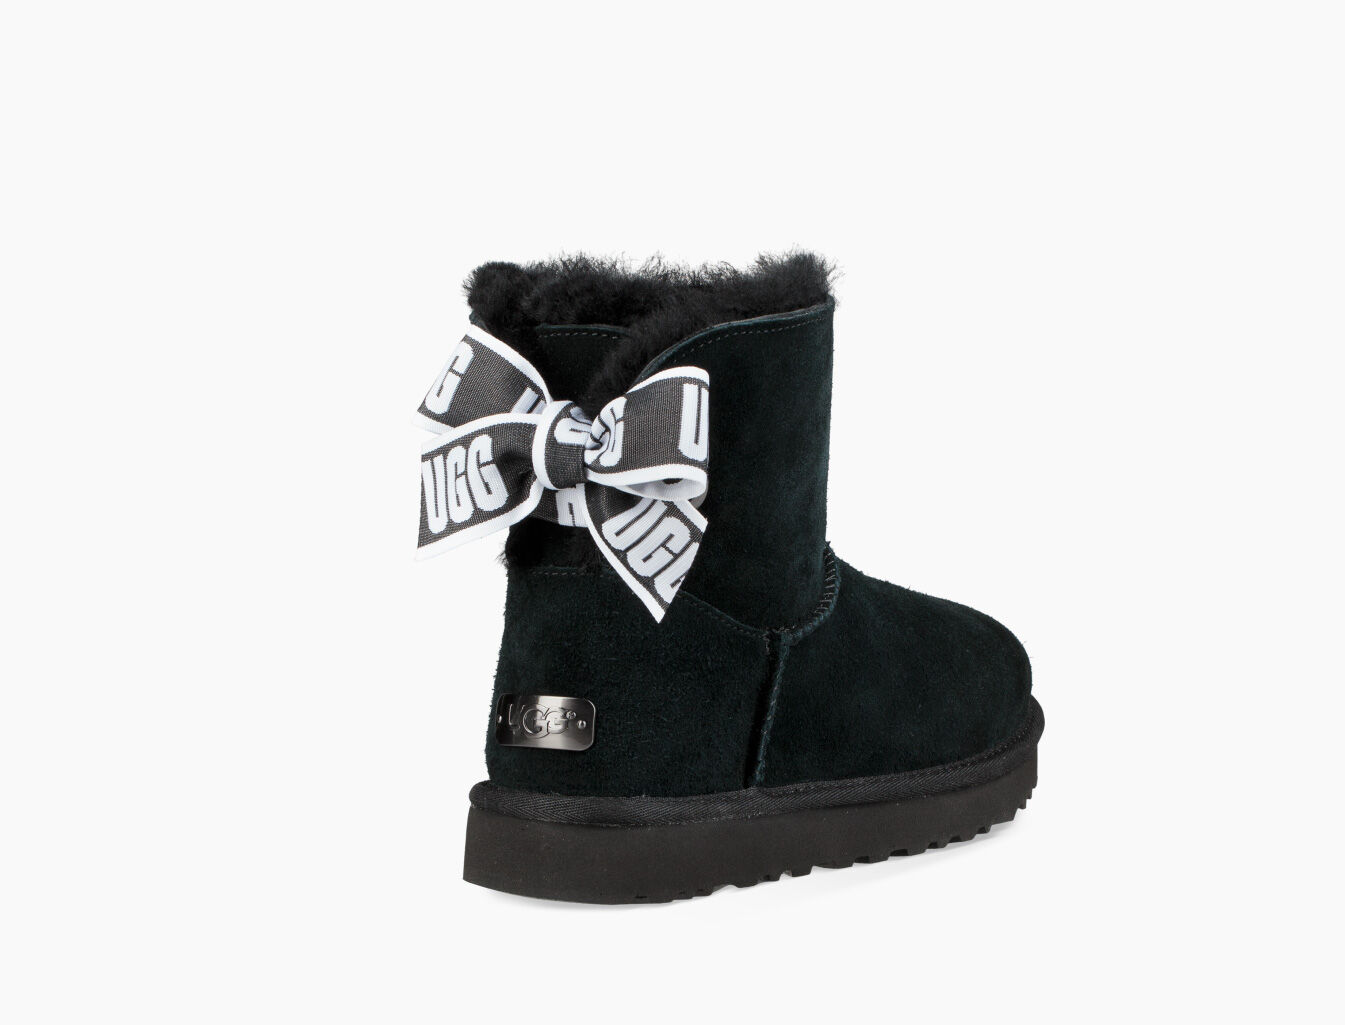 women s customizable bailey bow mini boot ugg official rh ugg com